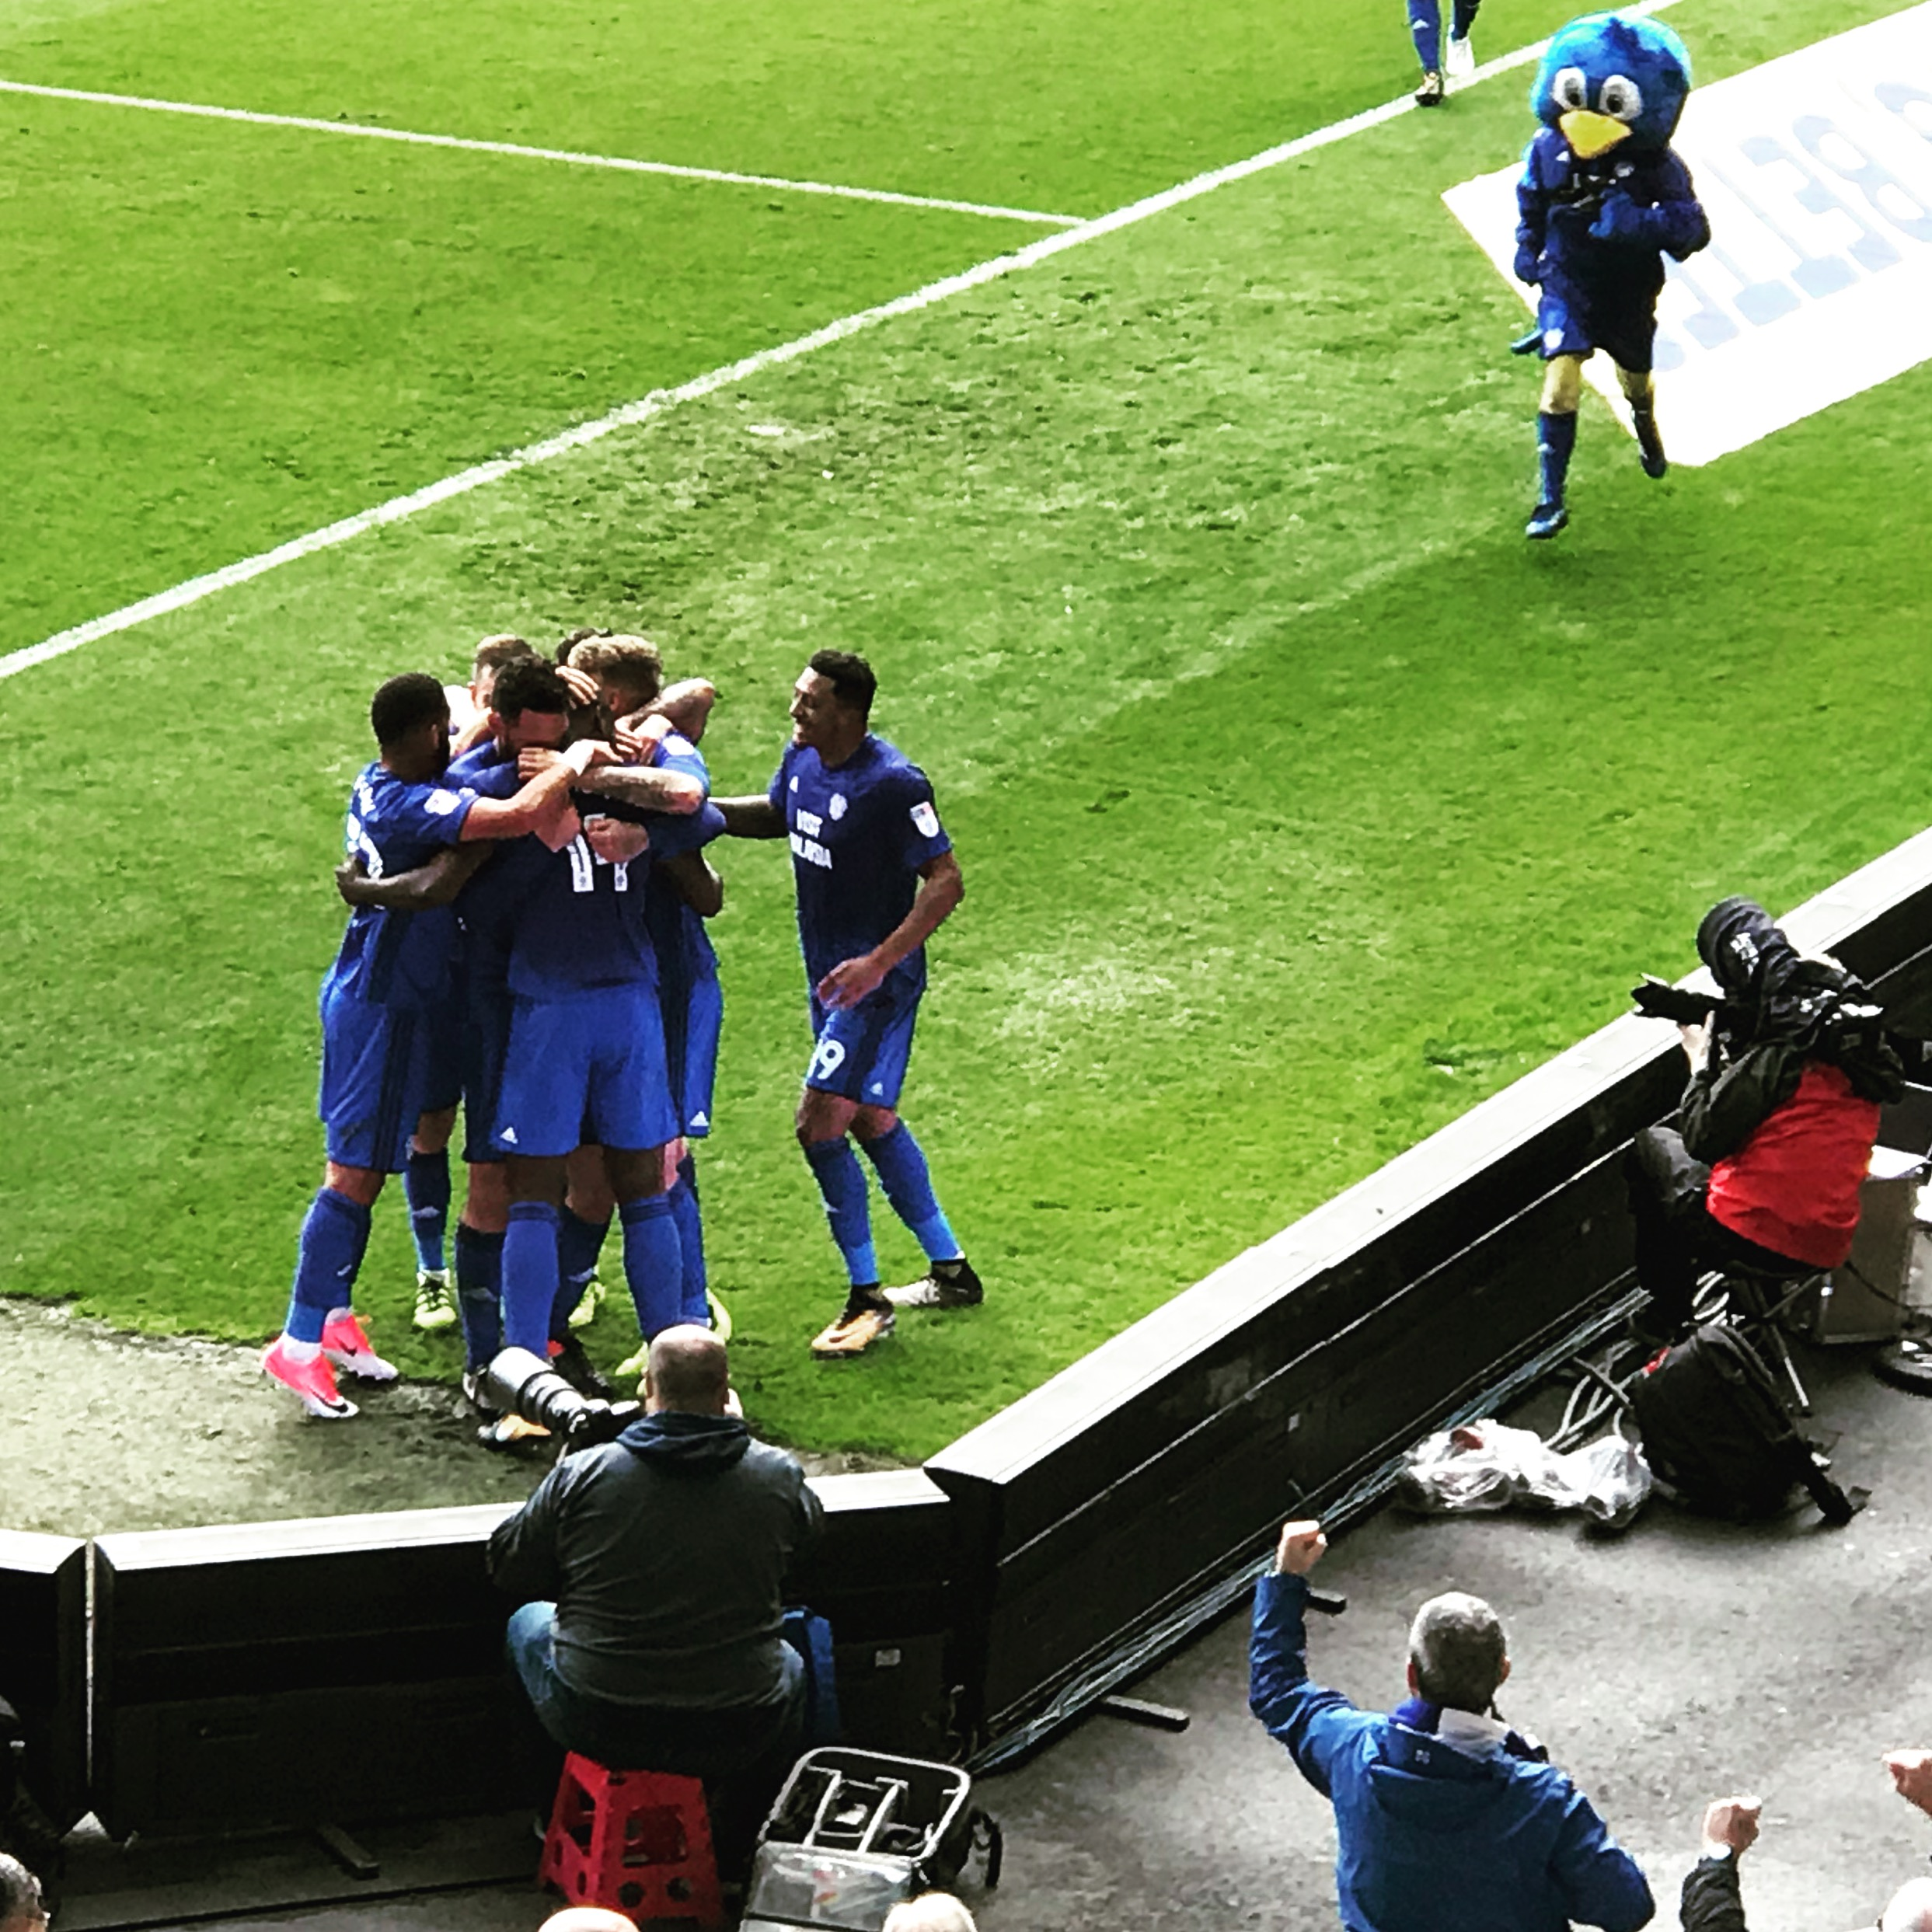 Cardiff City 1 - 1 Sheffield Wednesday. Match Report